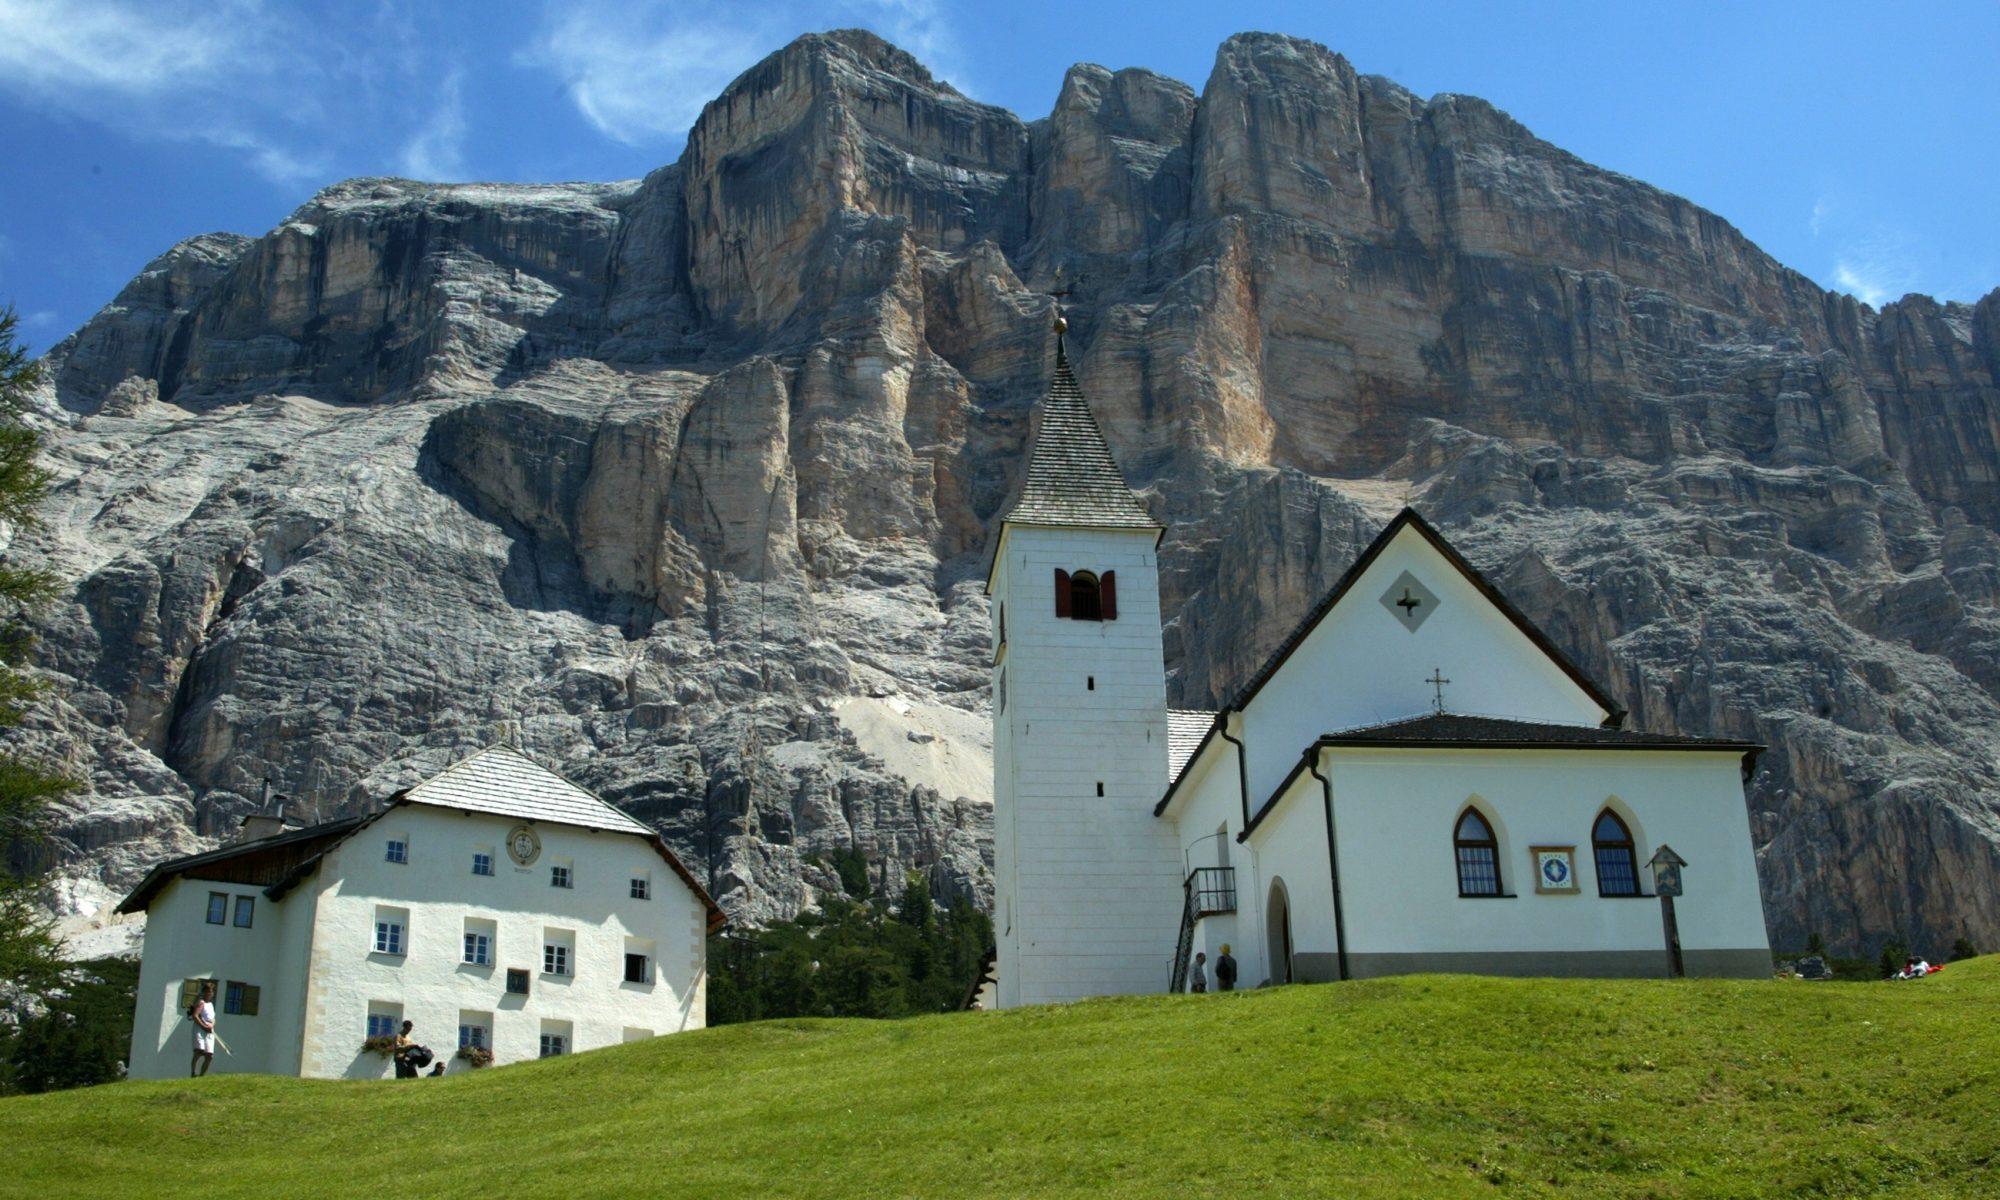 Alta Badia_chiesetta di S. Croce_by Freddy Planinschek